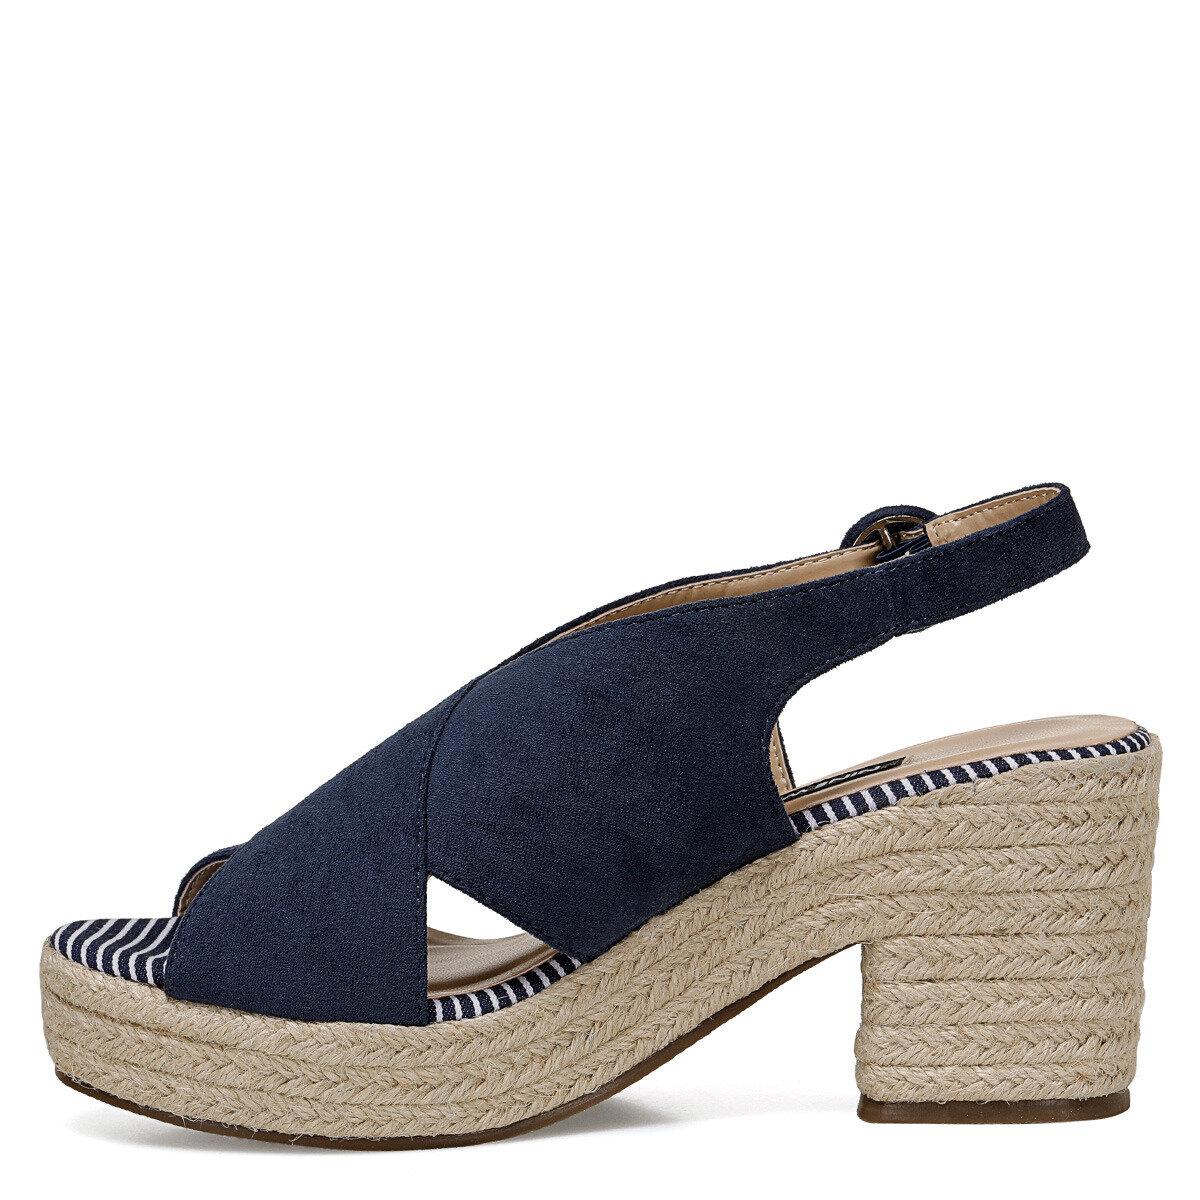 NORMINA Lacivert Kadın Dolgu Topuklu Sandalet